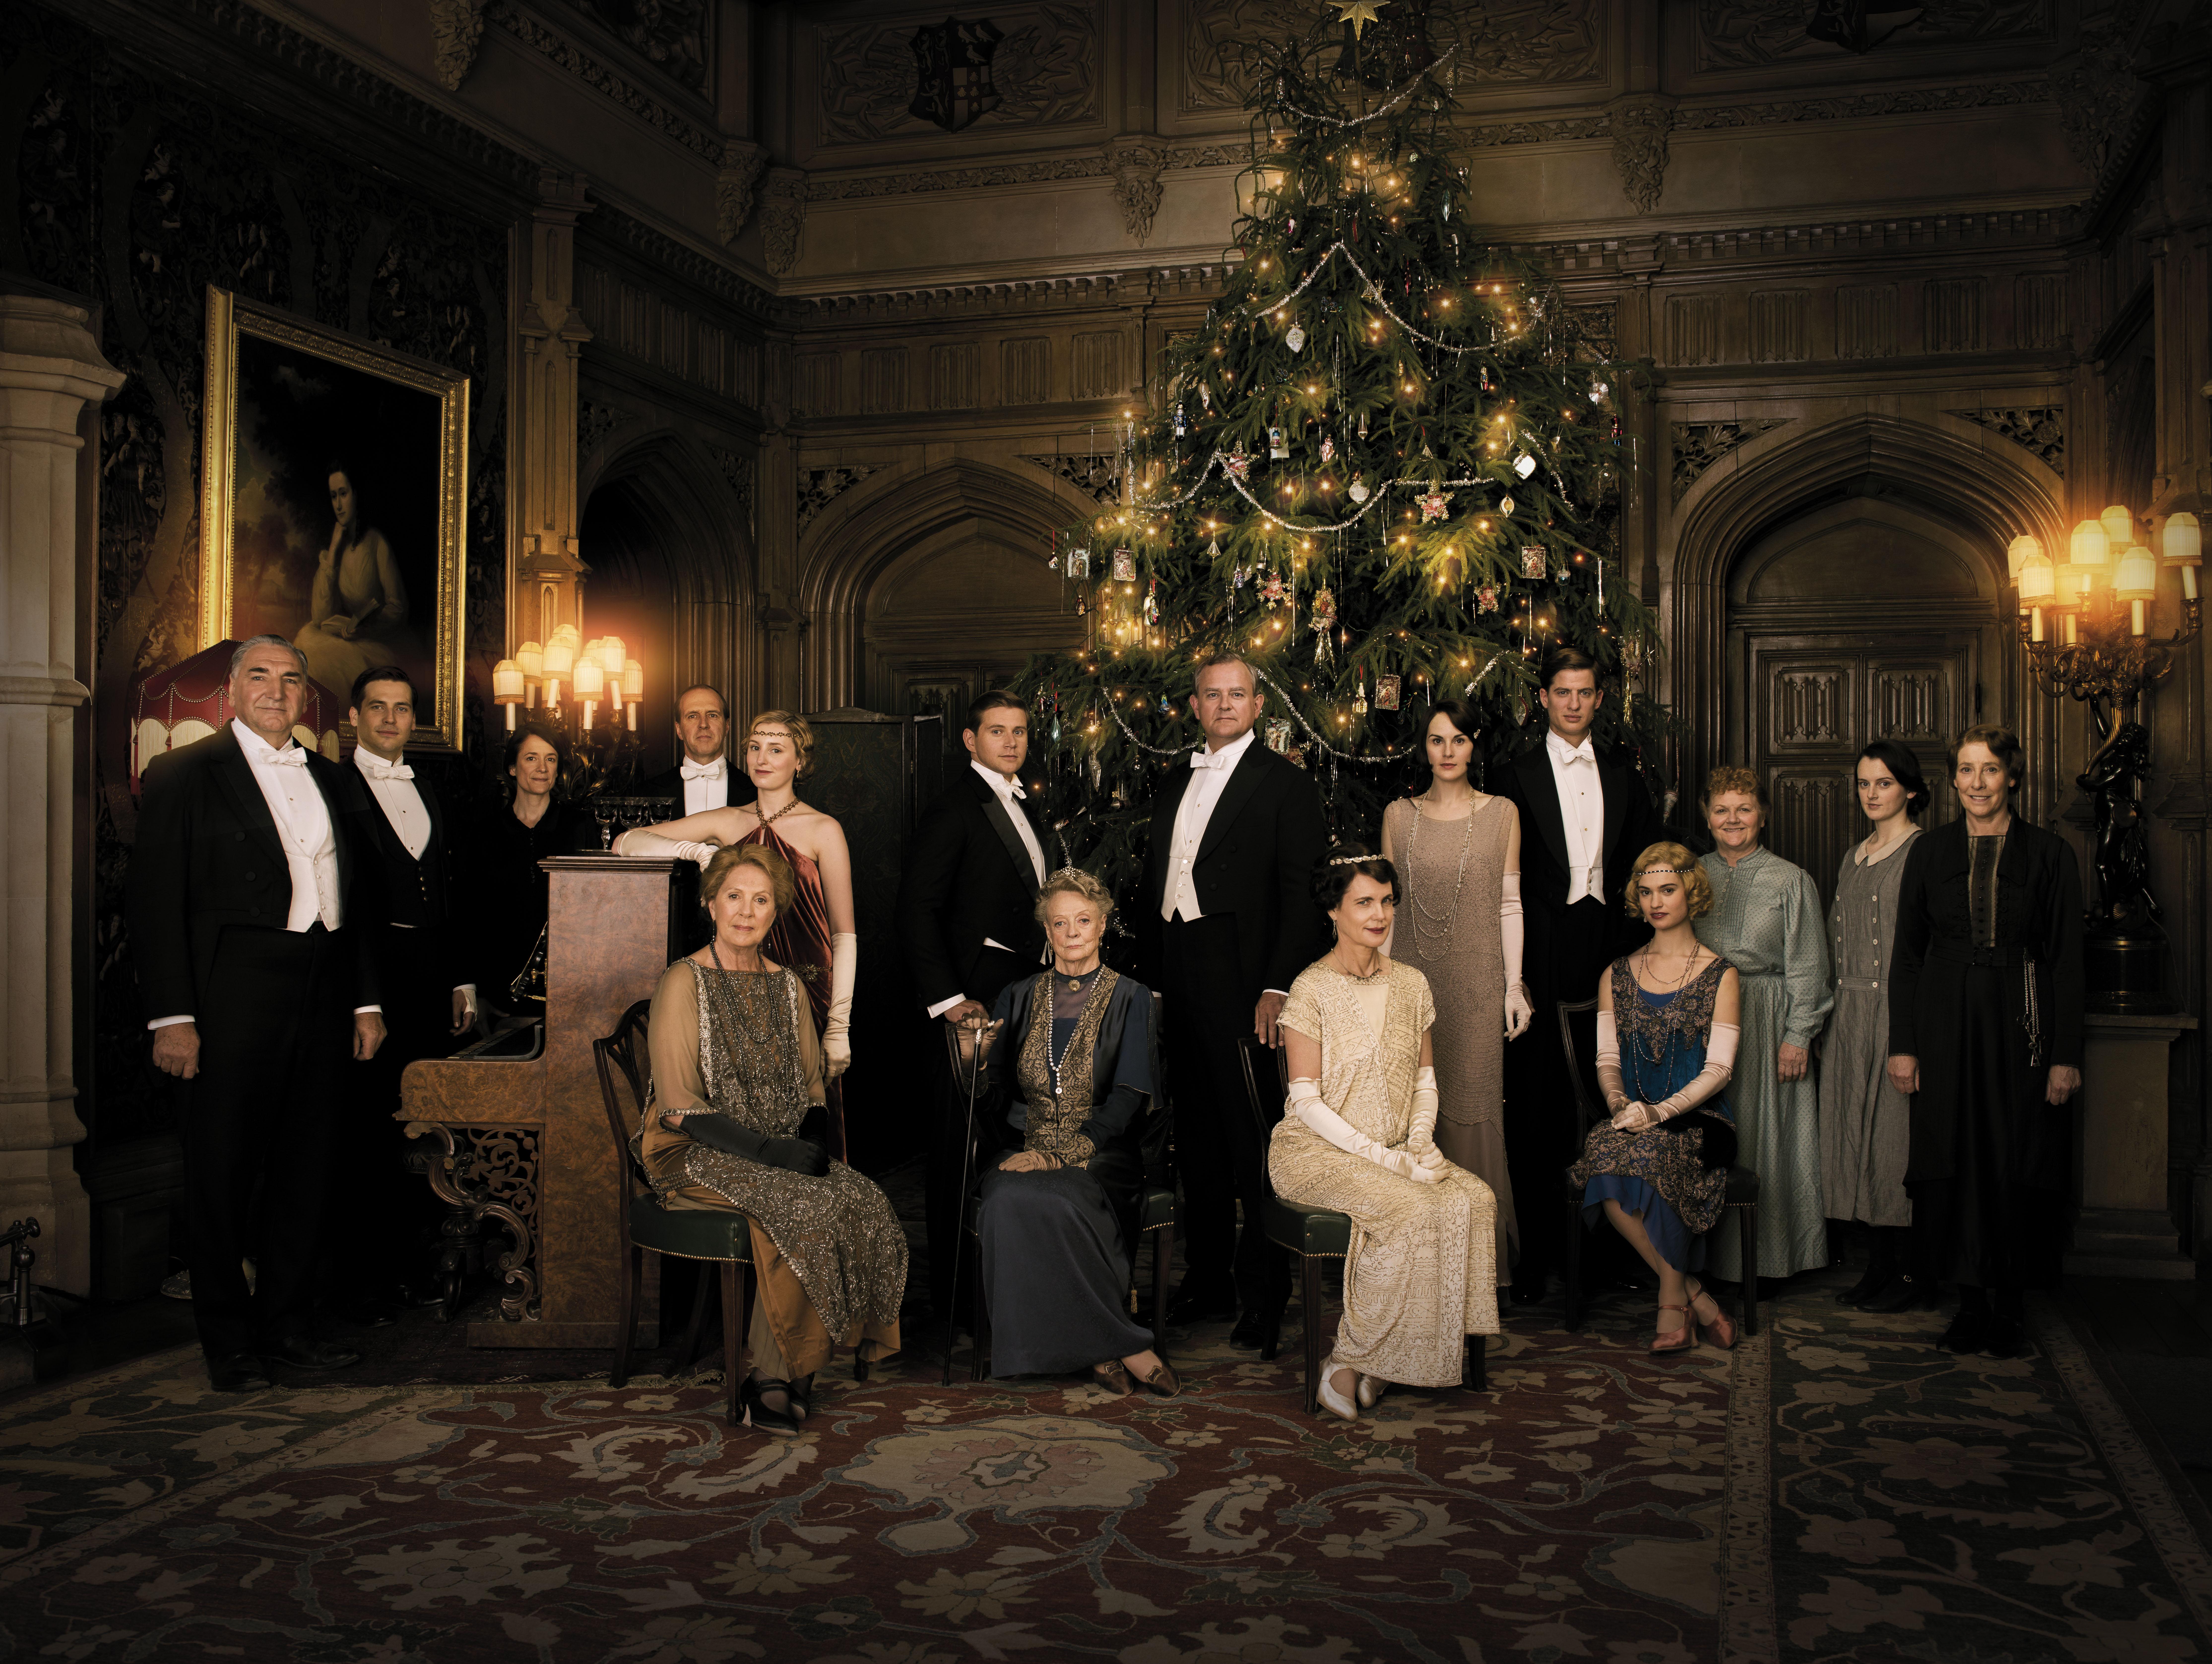 The Season 5 cast of 'Downton Abbey'